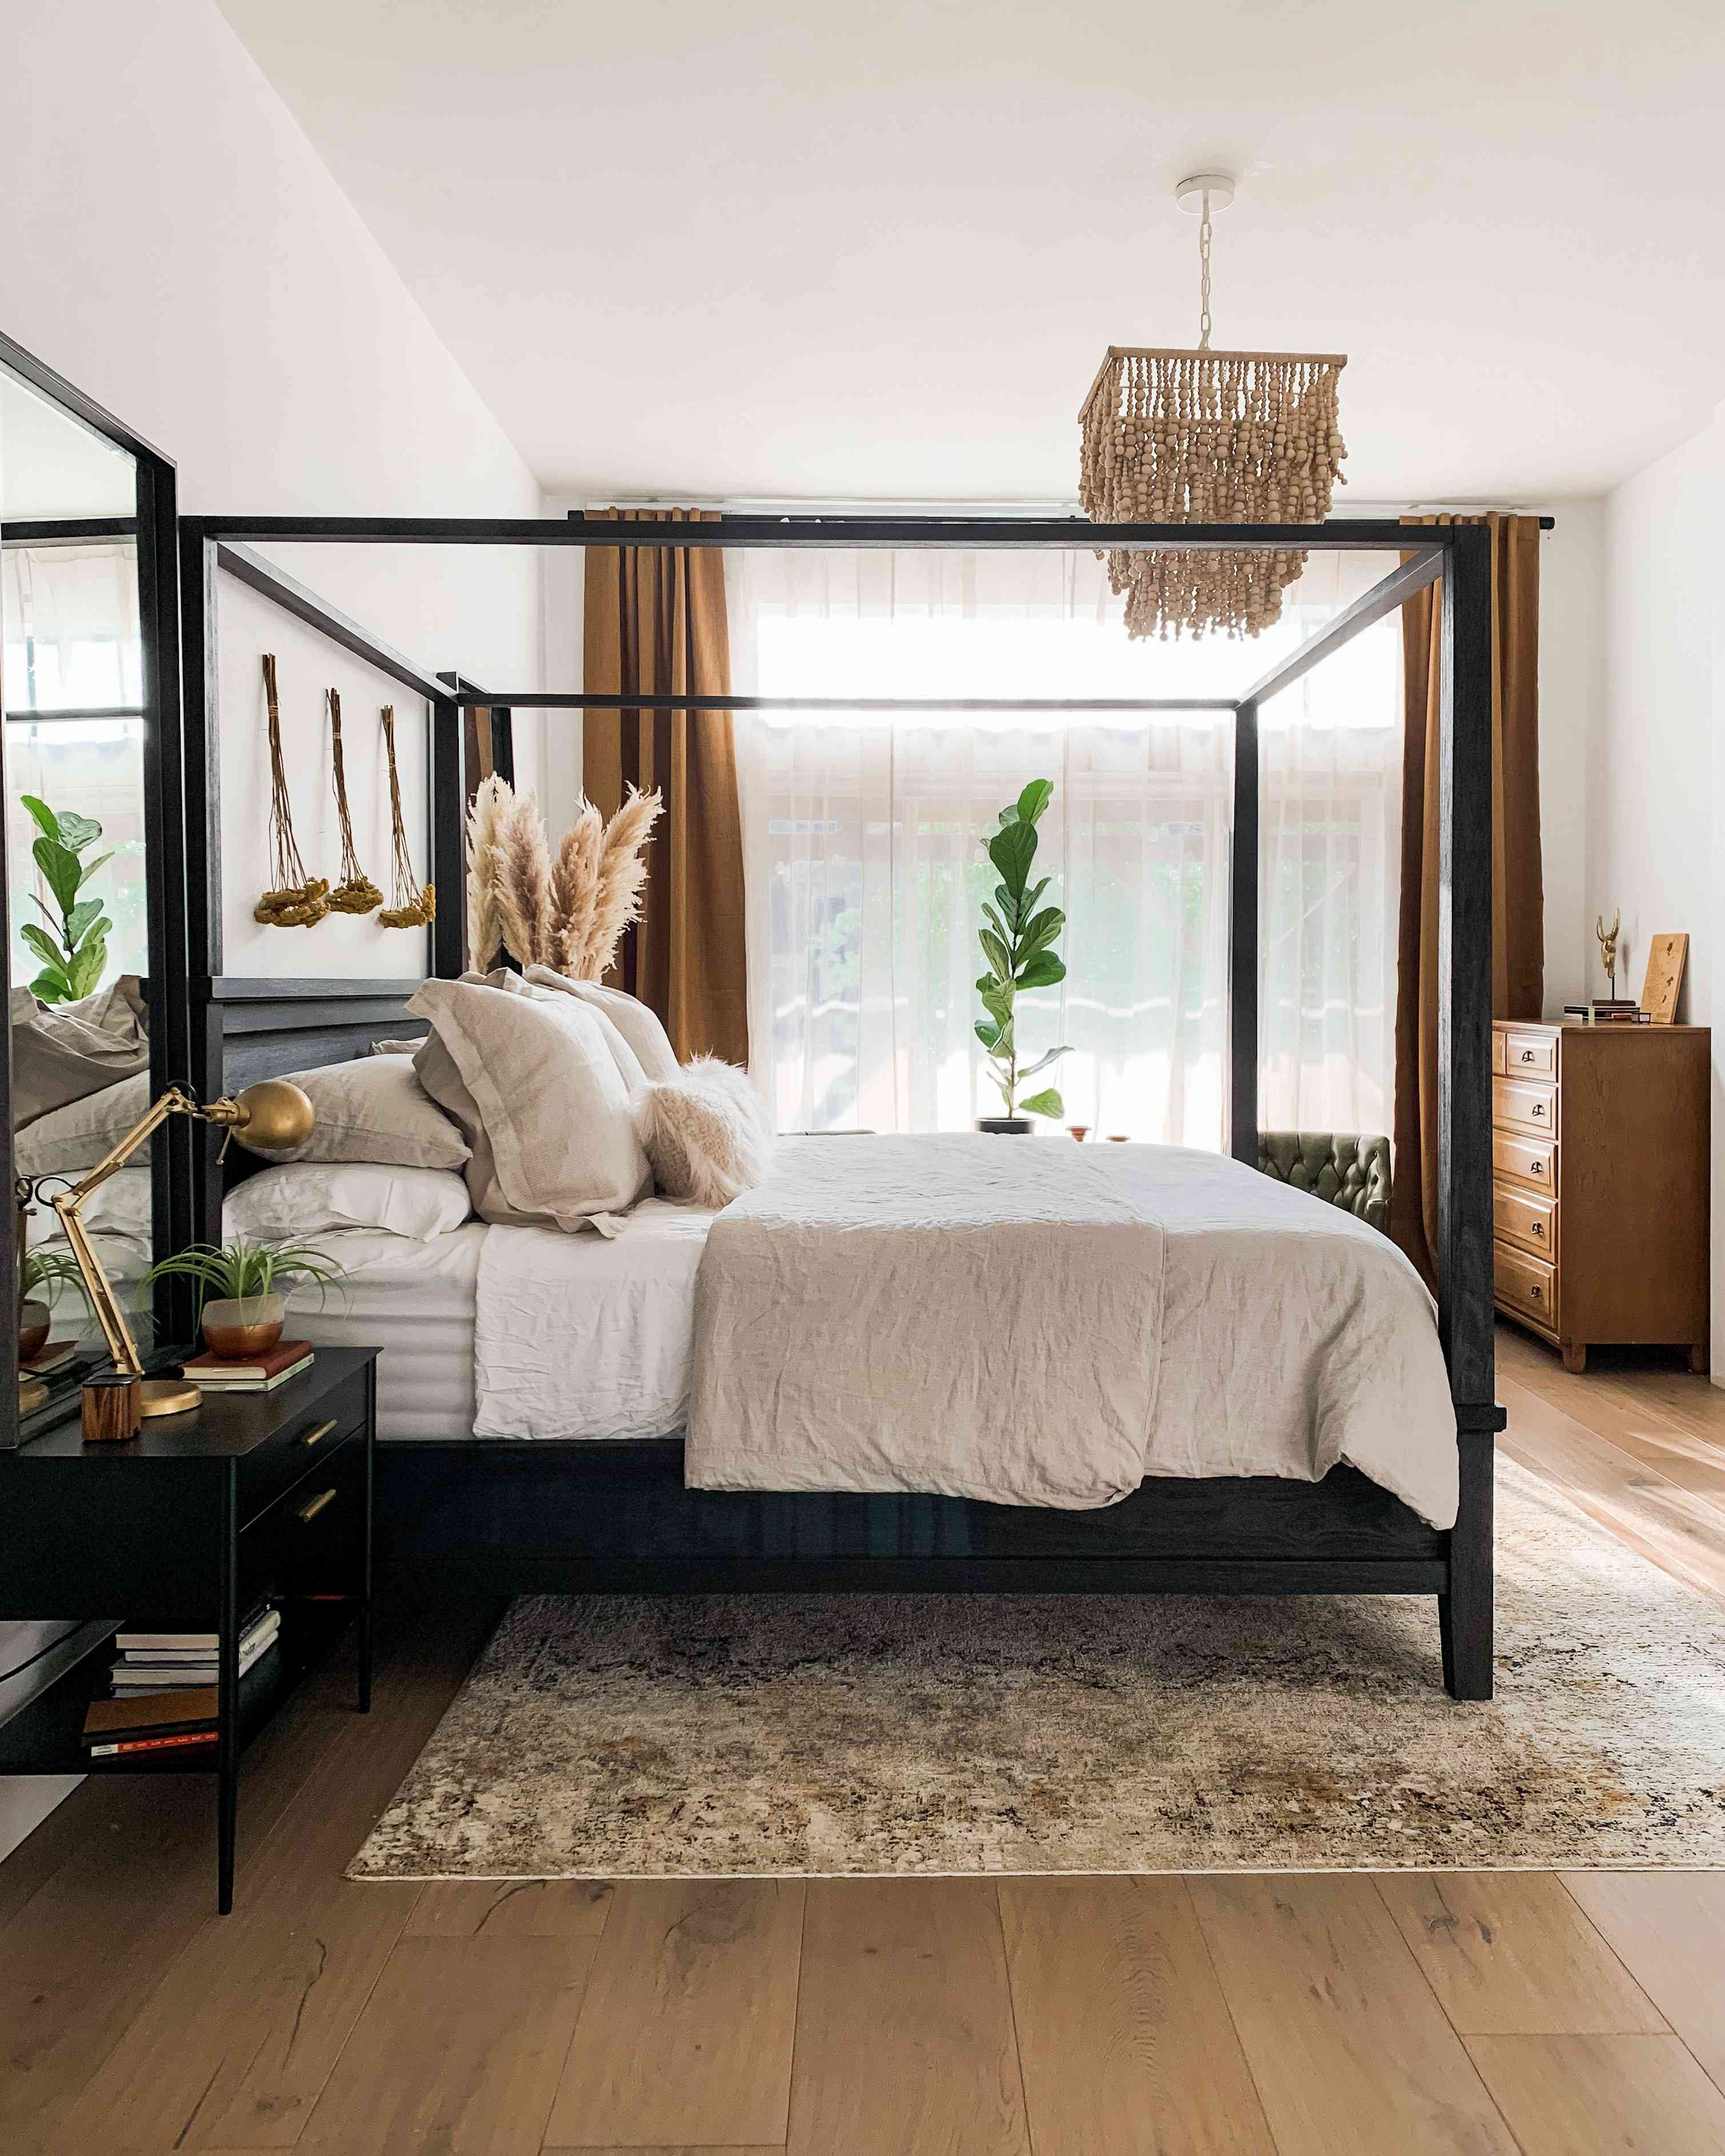 Bedroom with black bed